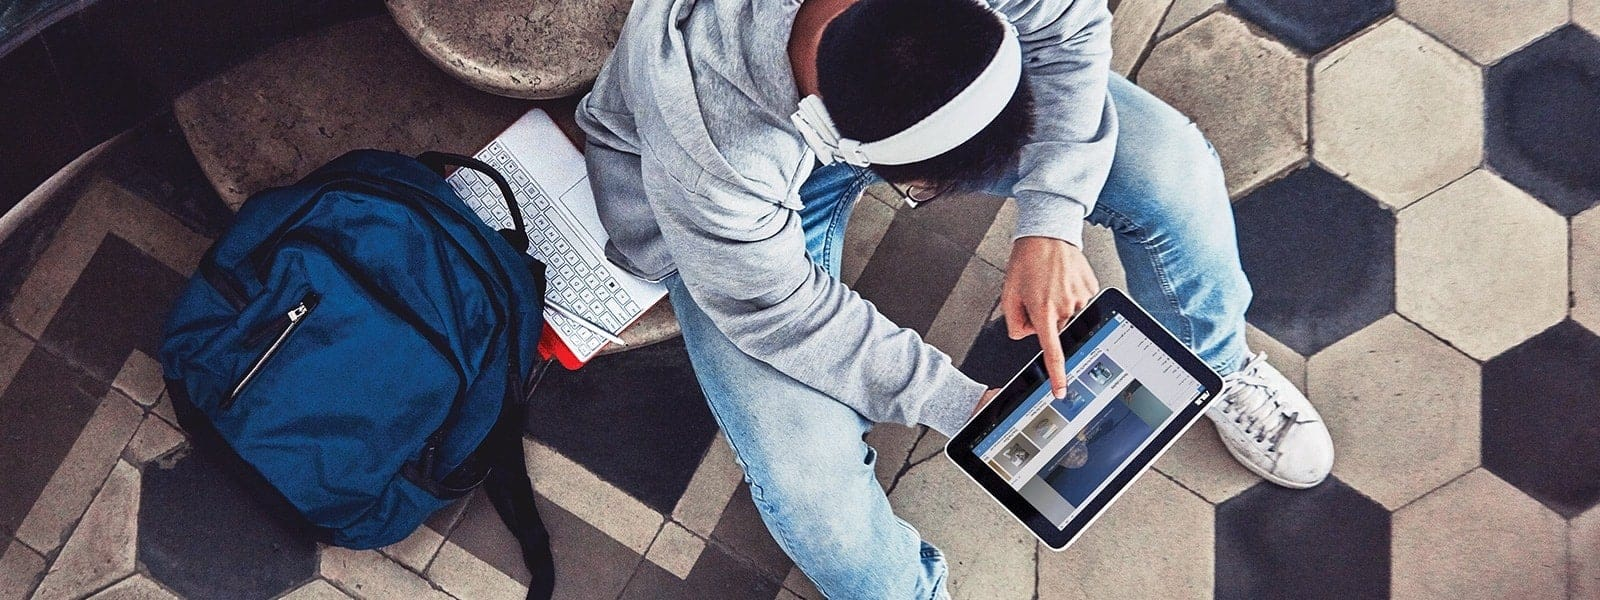 Estudiante que mira un dispositivo con Windows 10